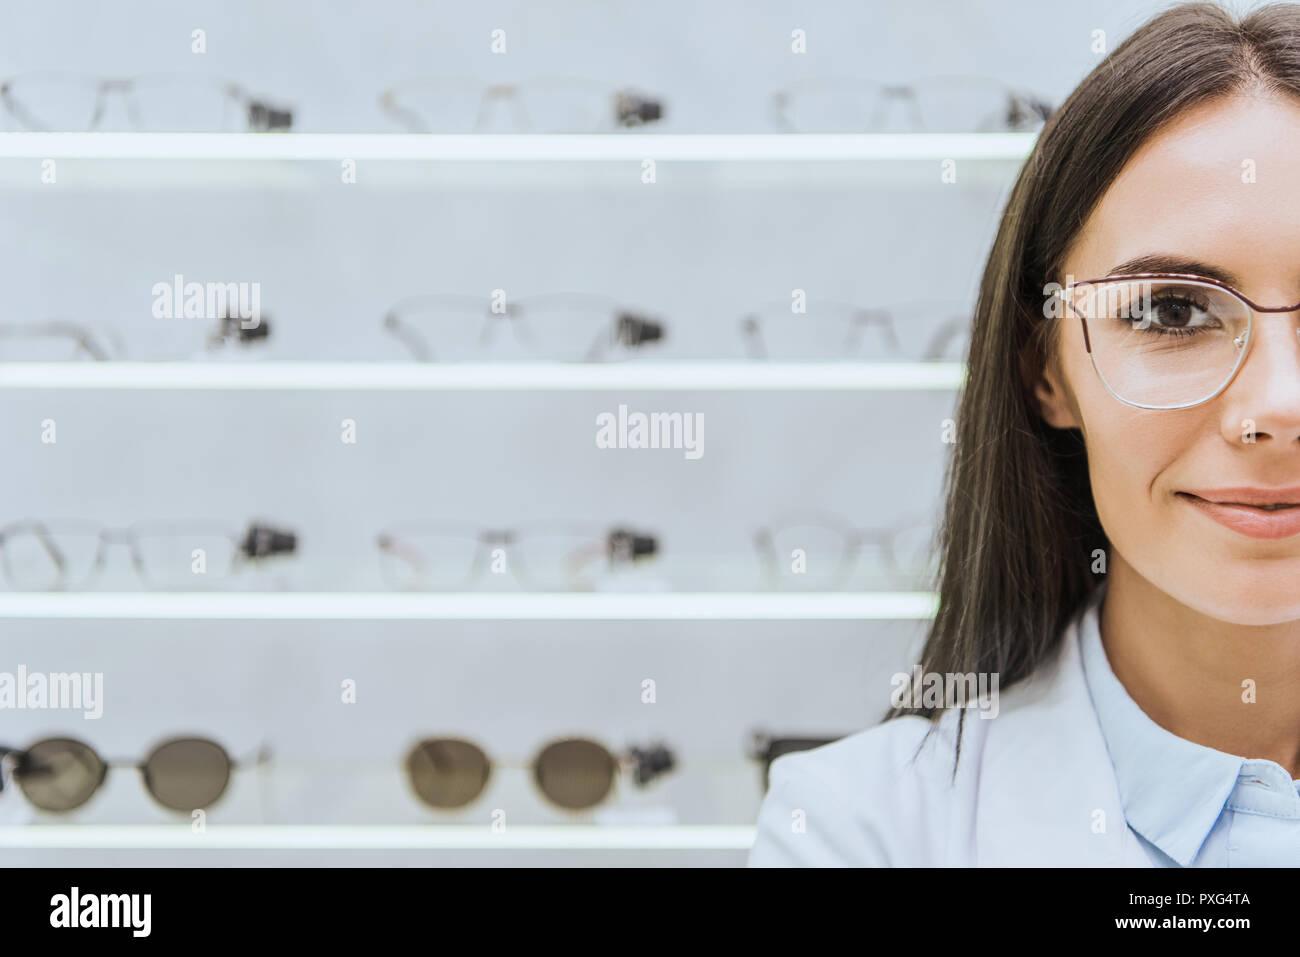 c6af75bd62d241 Belle femme optométriste dans lunettes à optica permanent Photo Stock